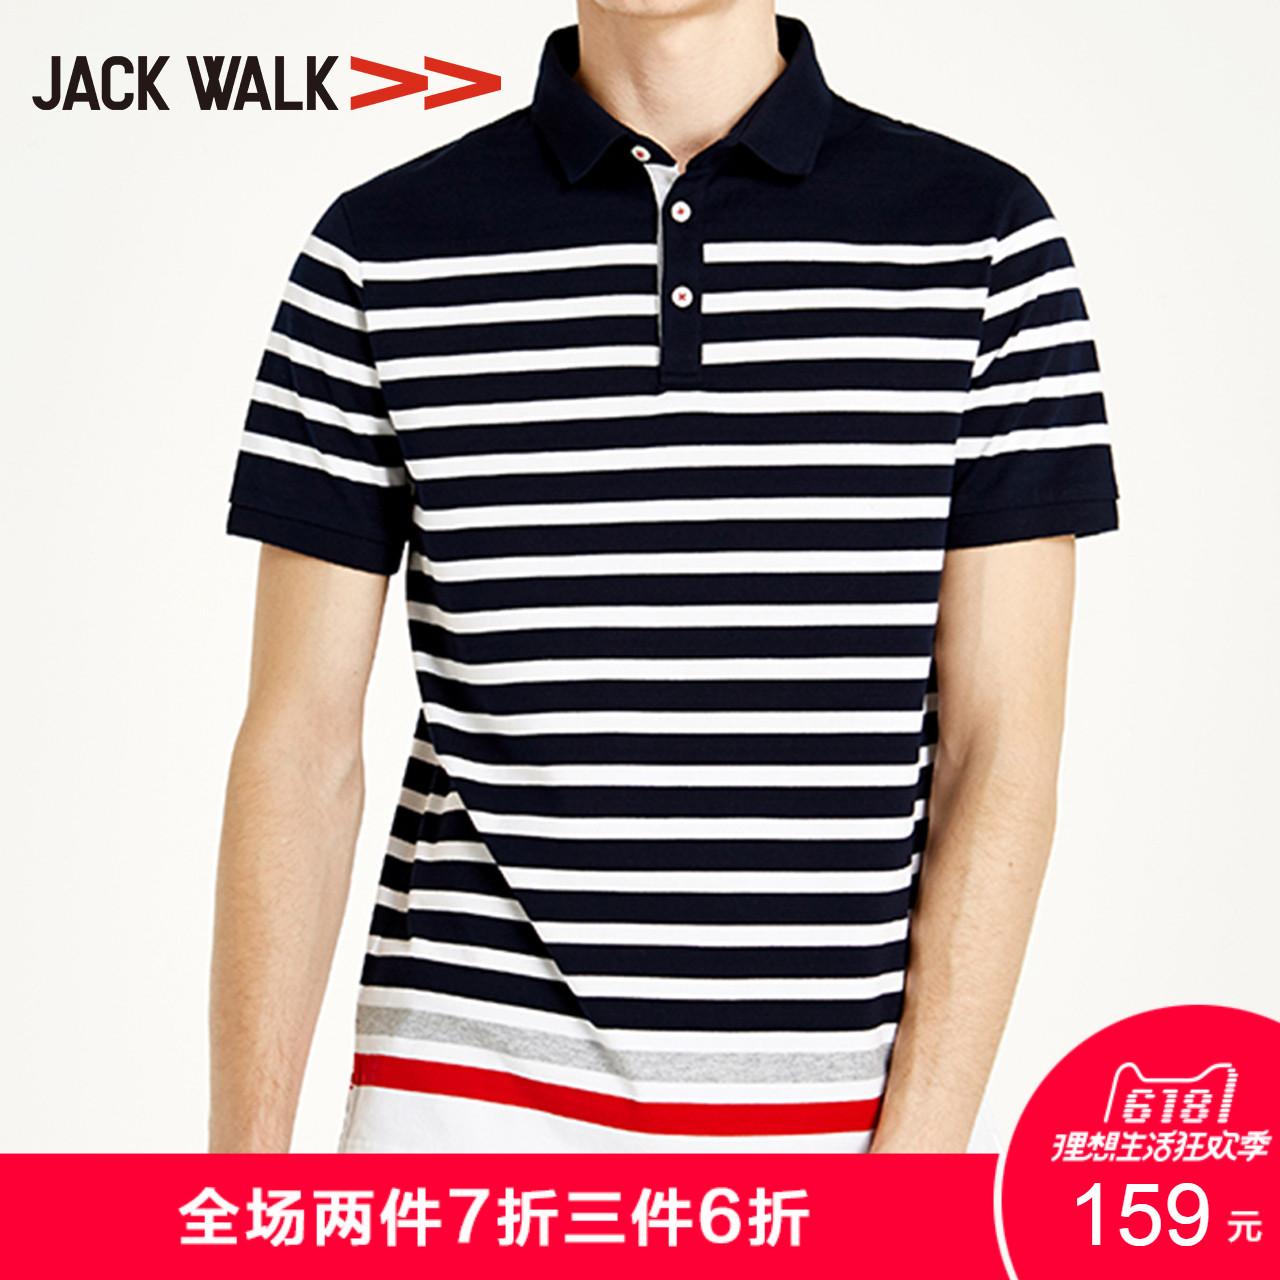 Jackwalk拉夏贝尔男装条纹Polo衫翻领短袖男2018春季新品杰克沃克